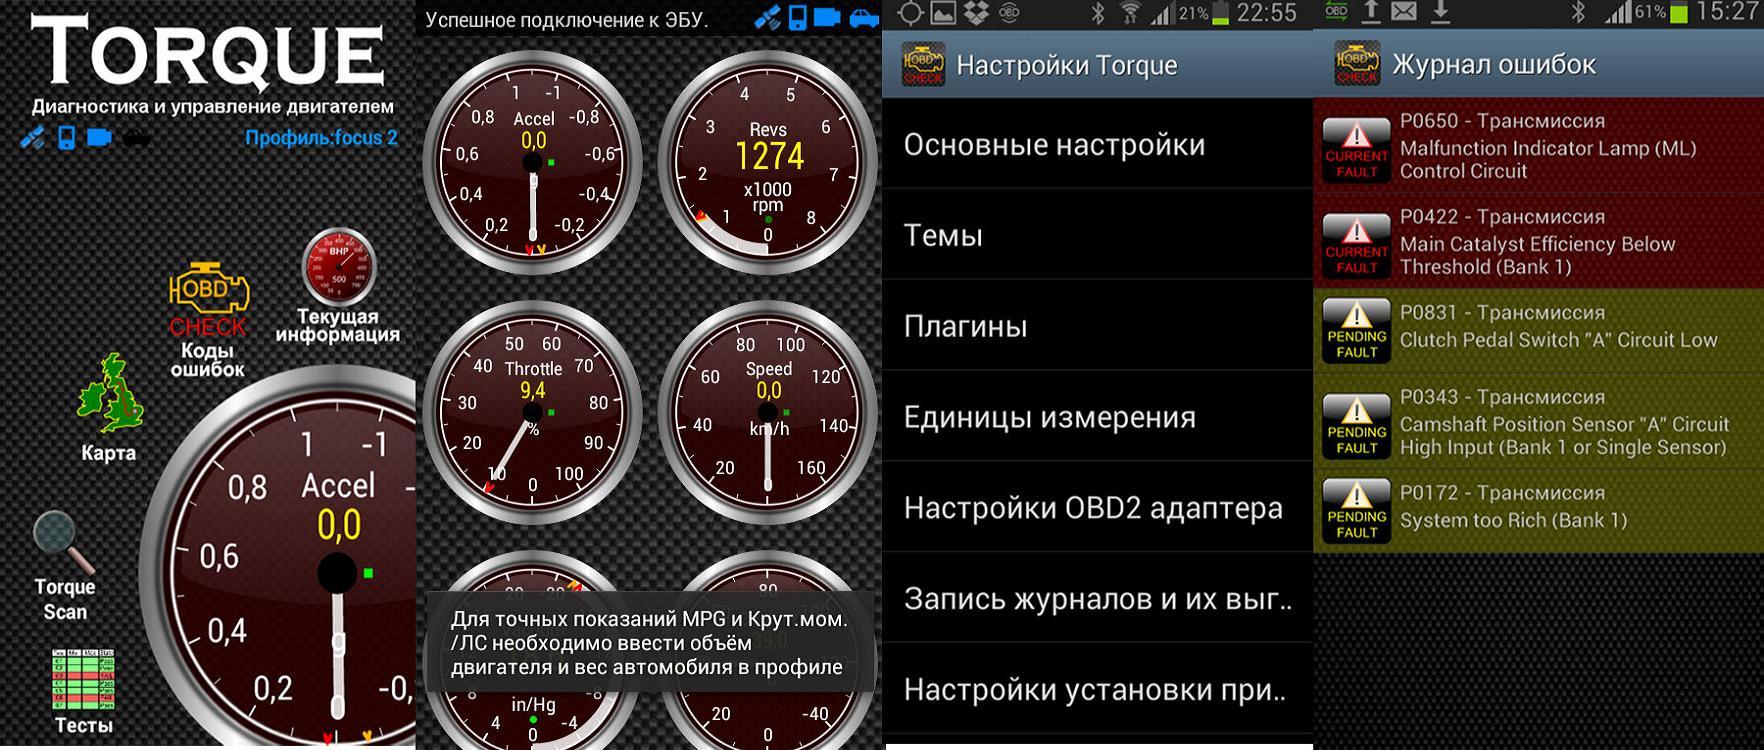 TorquePro - программа для диагностики авто на андроиде